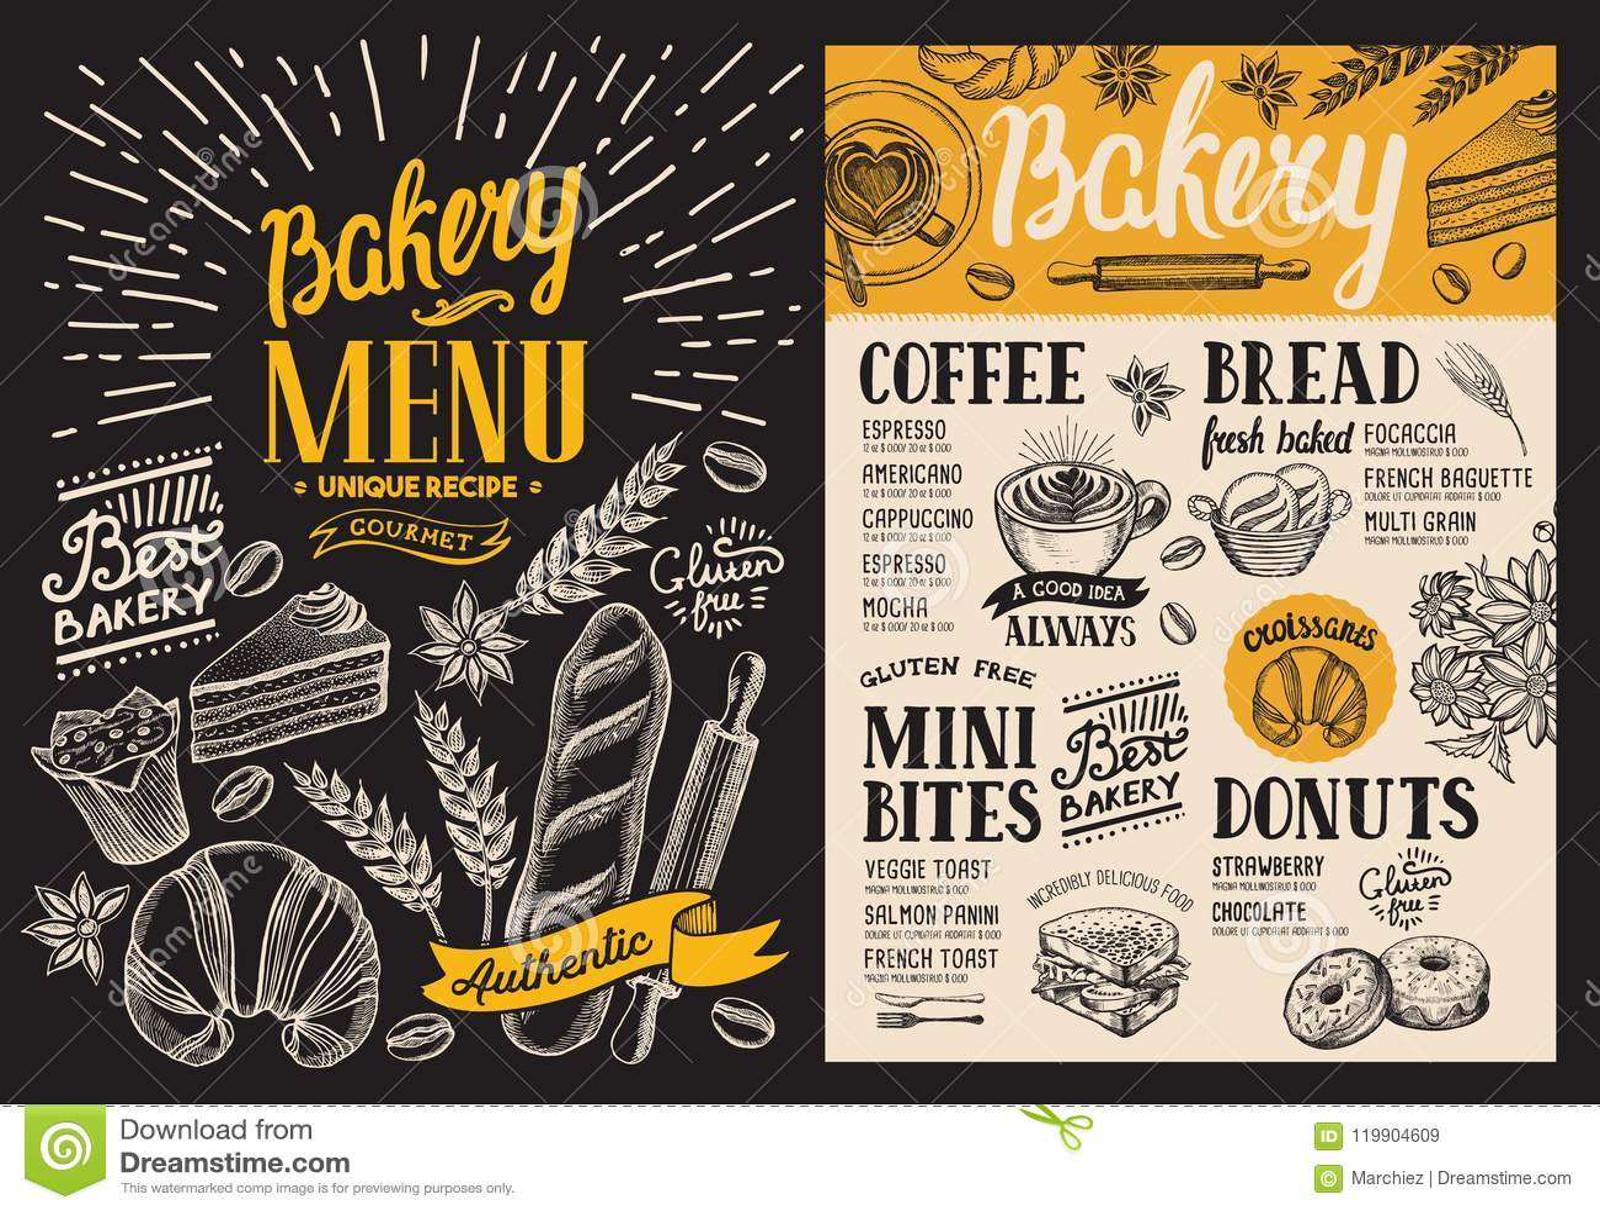 bakery dessert menu for restaurant on blackboard background des